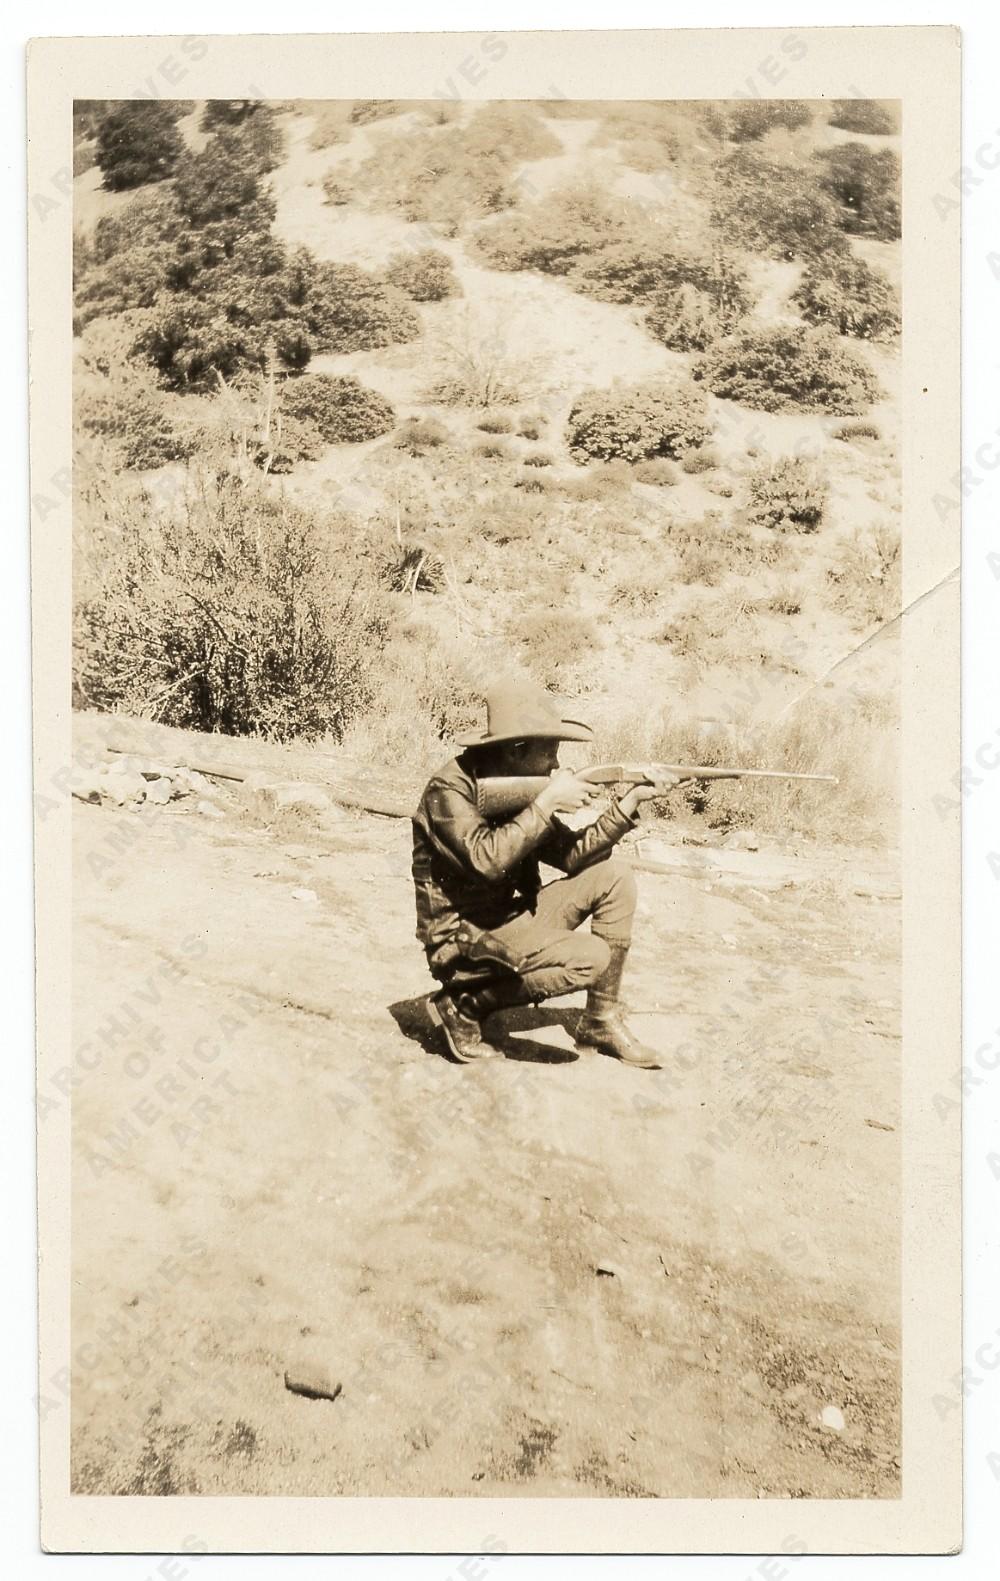 Jackson in Southern California, c 1927